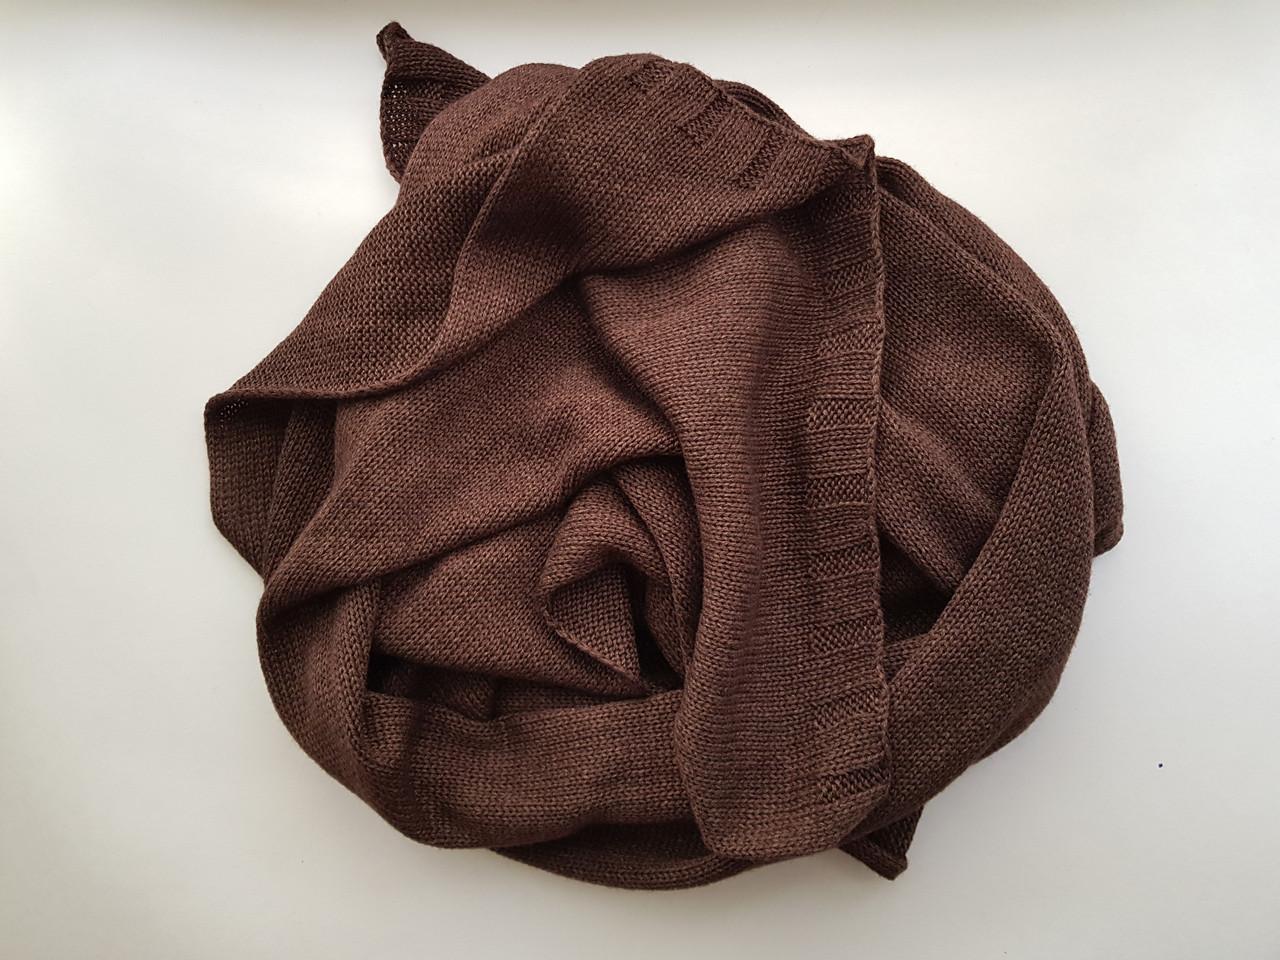 Кашемировый шарф knitted Chadrin коричневый, фото 1